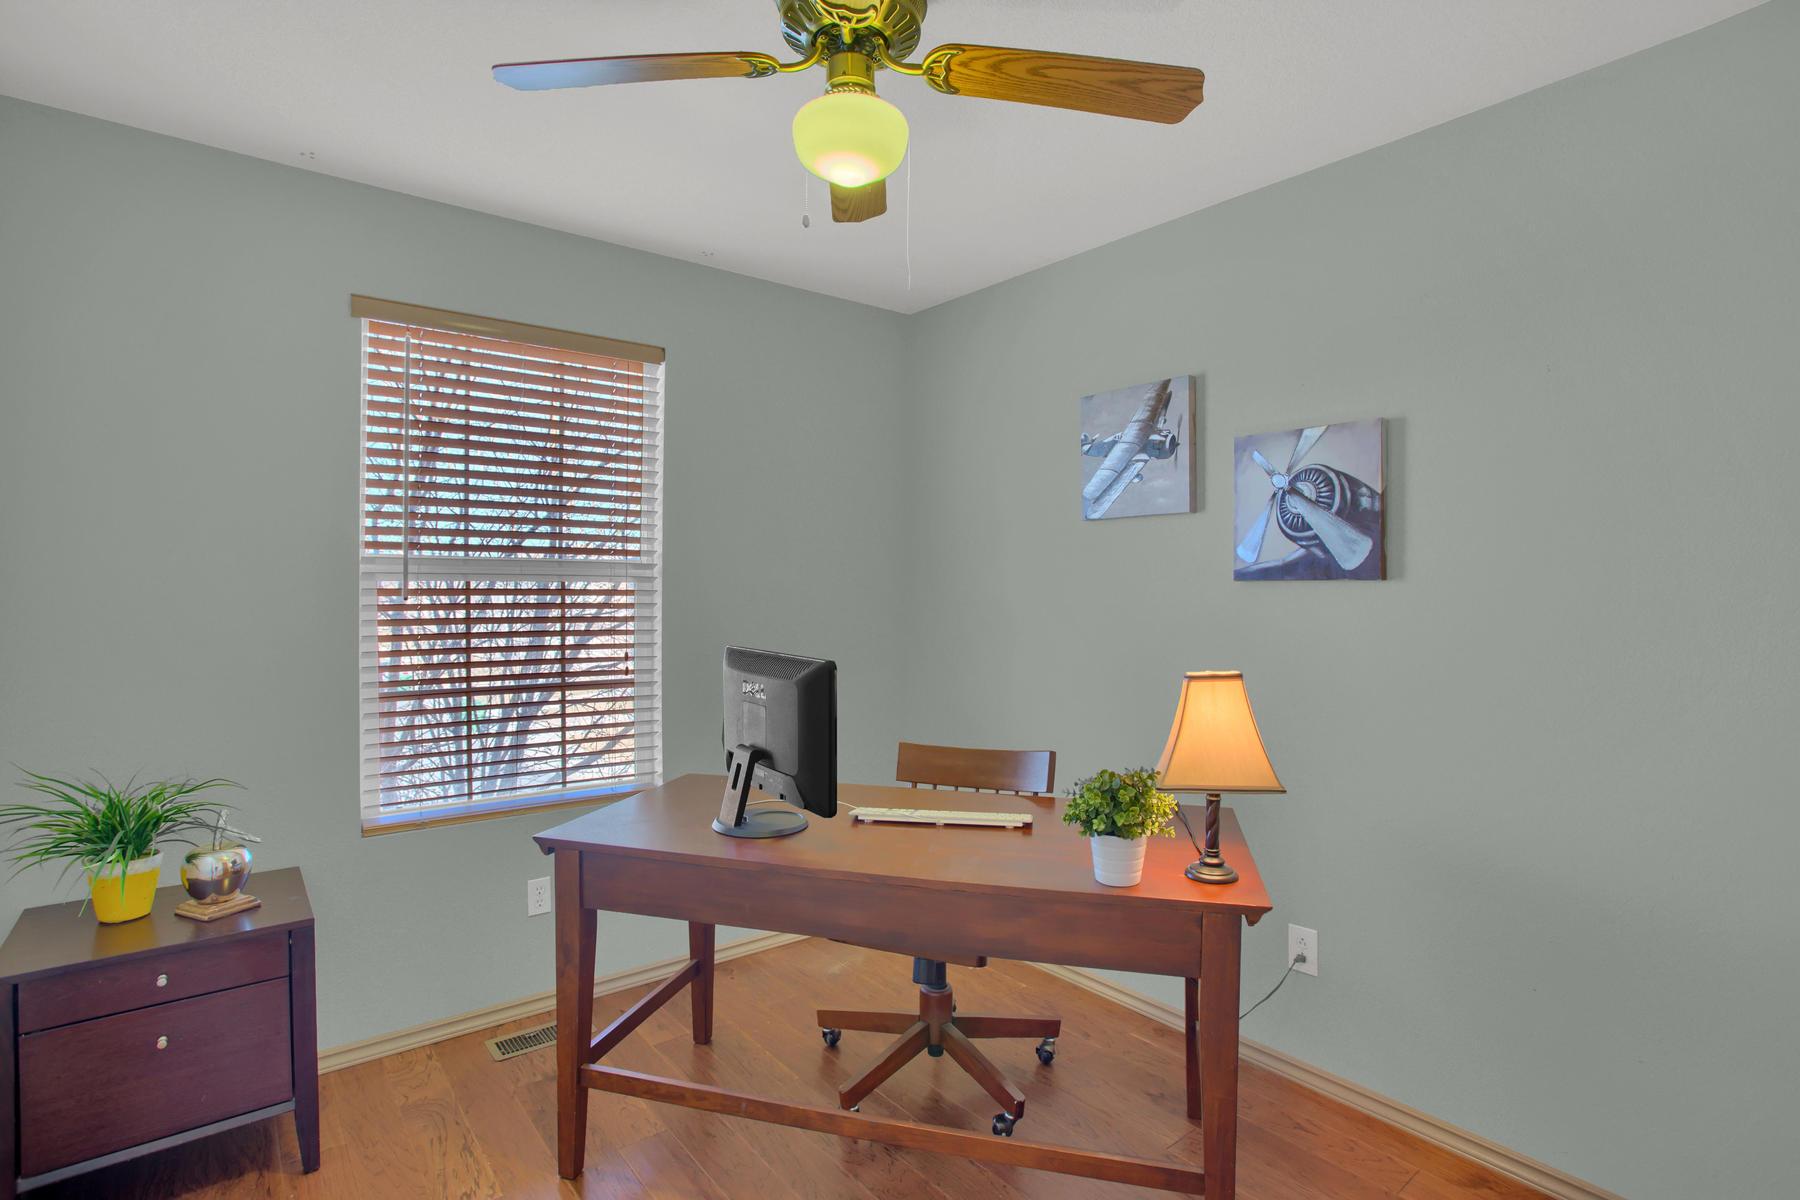 11662 Oakland Dr Commerce City-021-17-Bedroom-MLS_Size.jpg